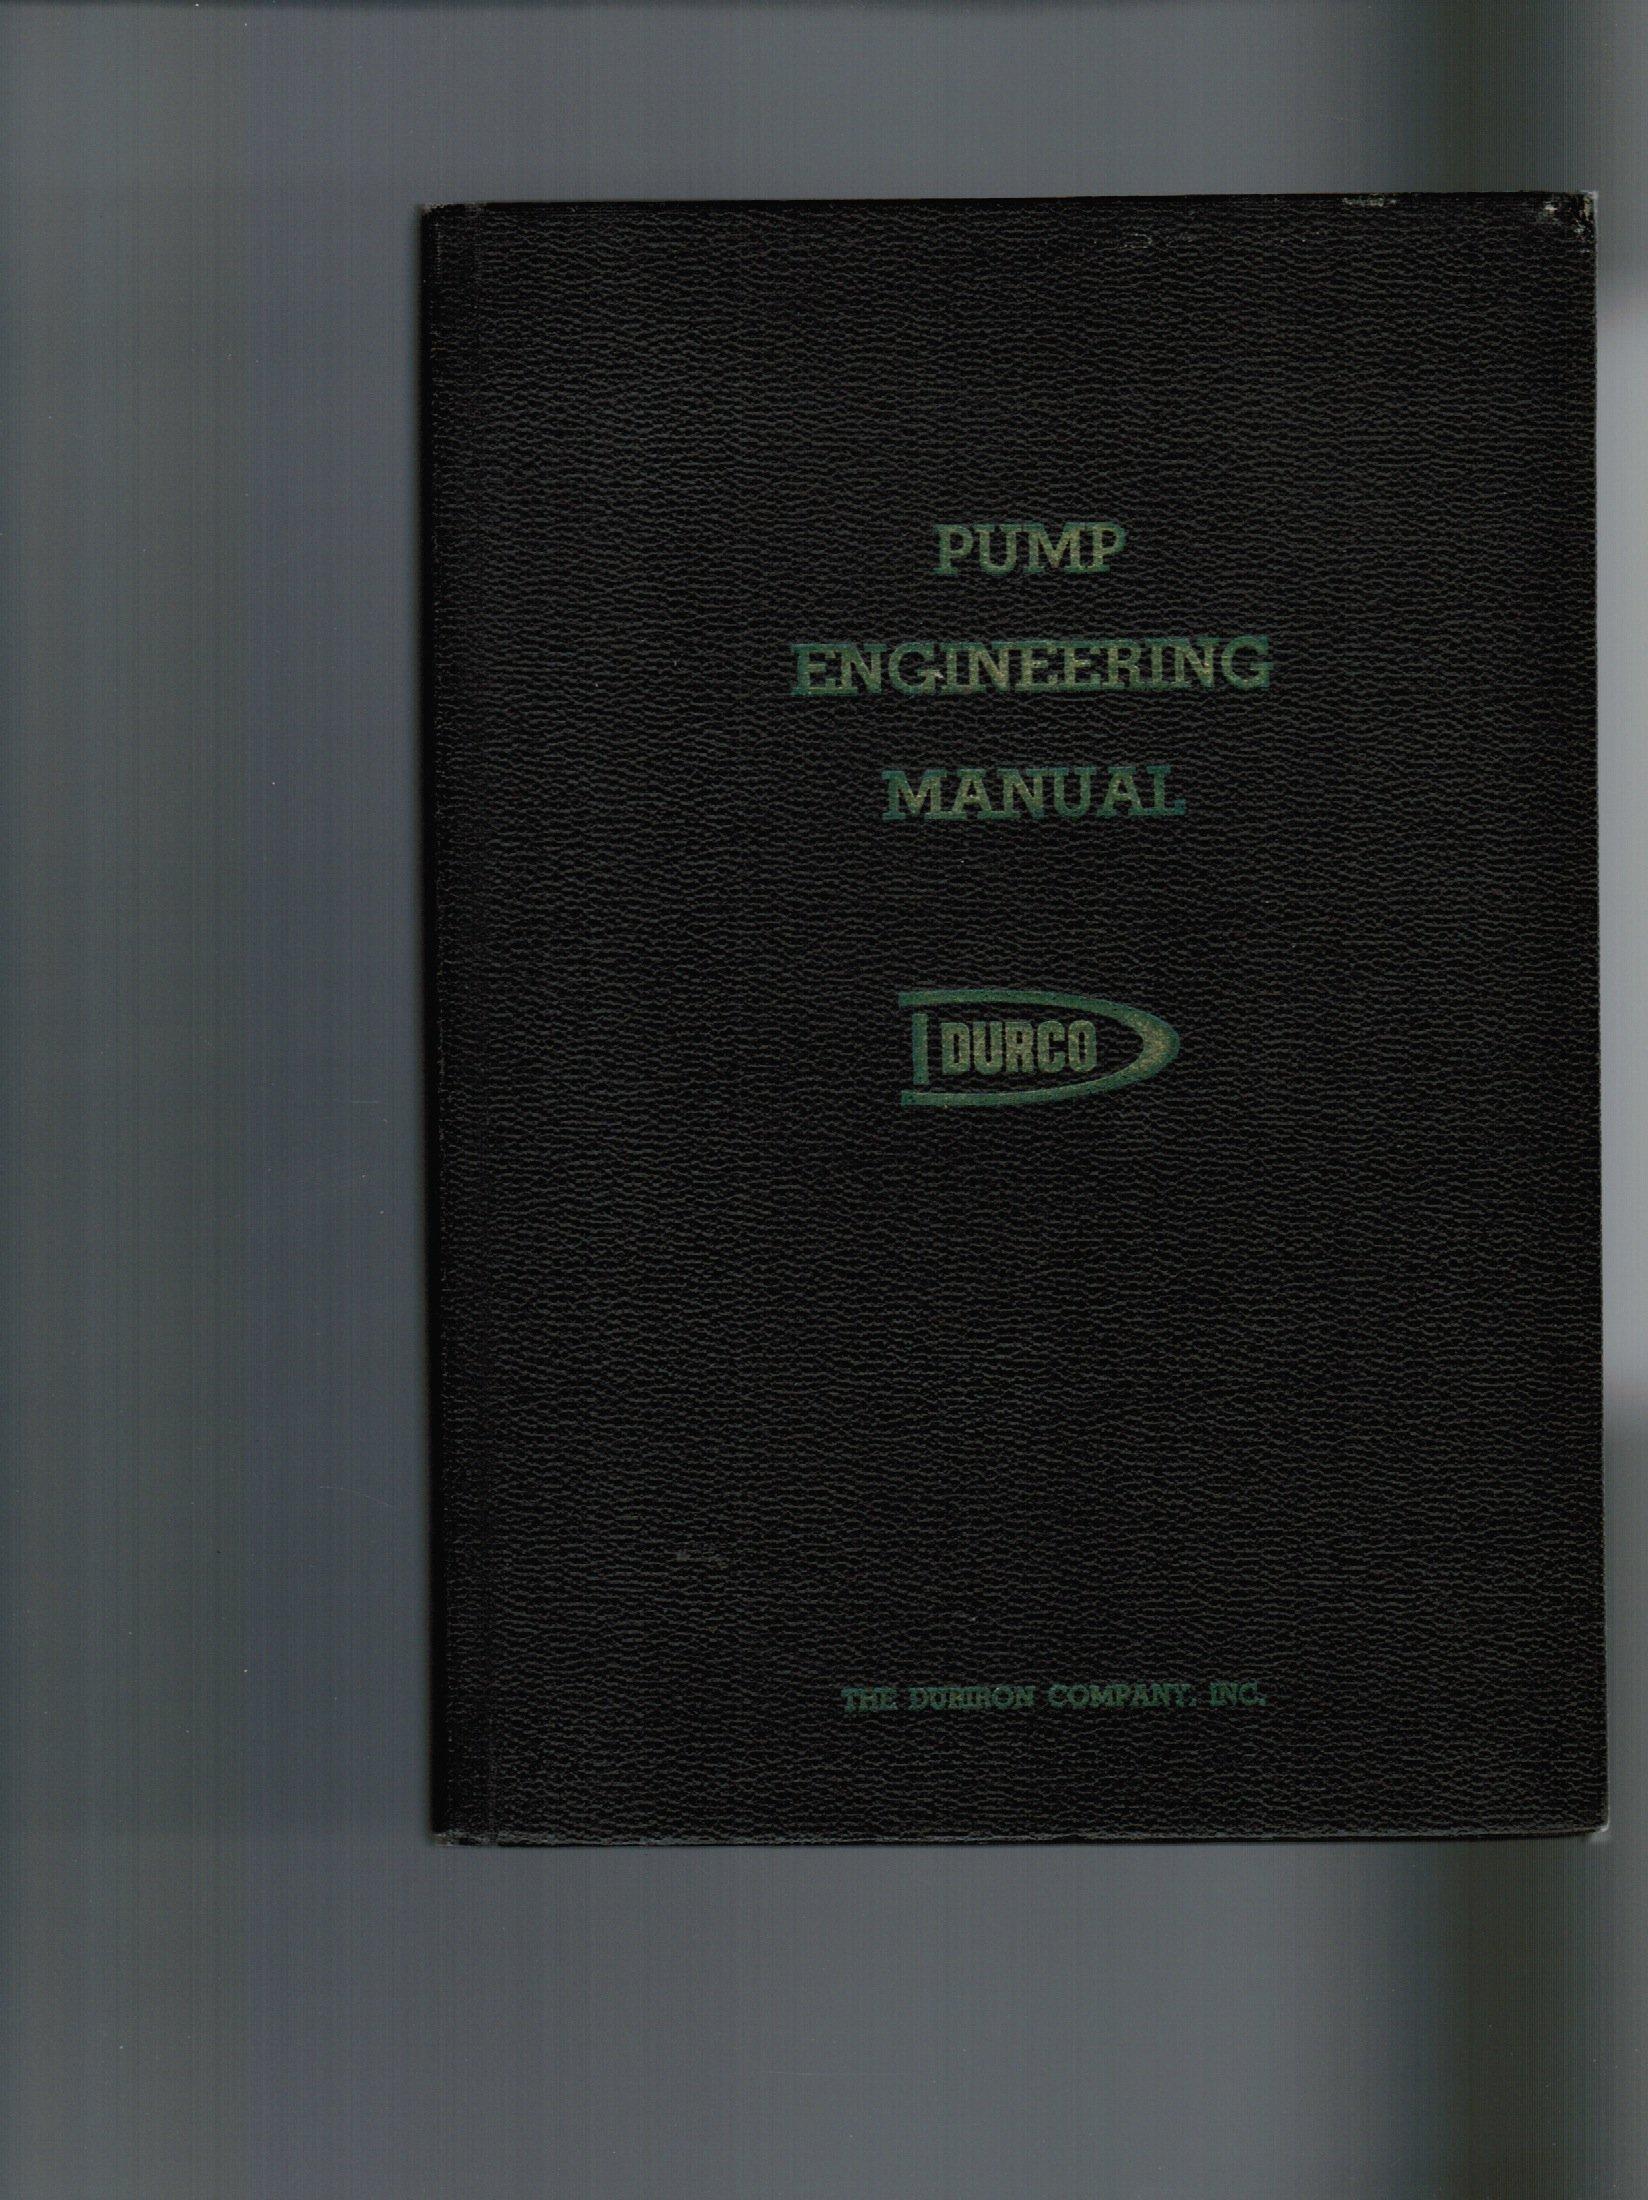 Pump Engineering Manual - Durco (Engineered Product Manual